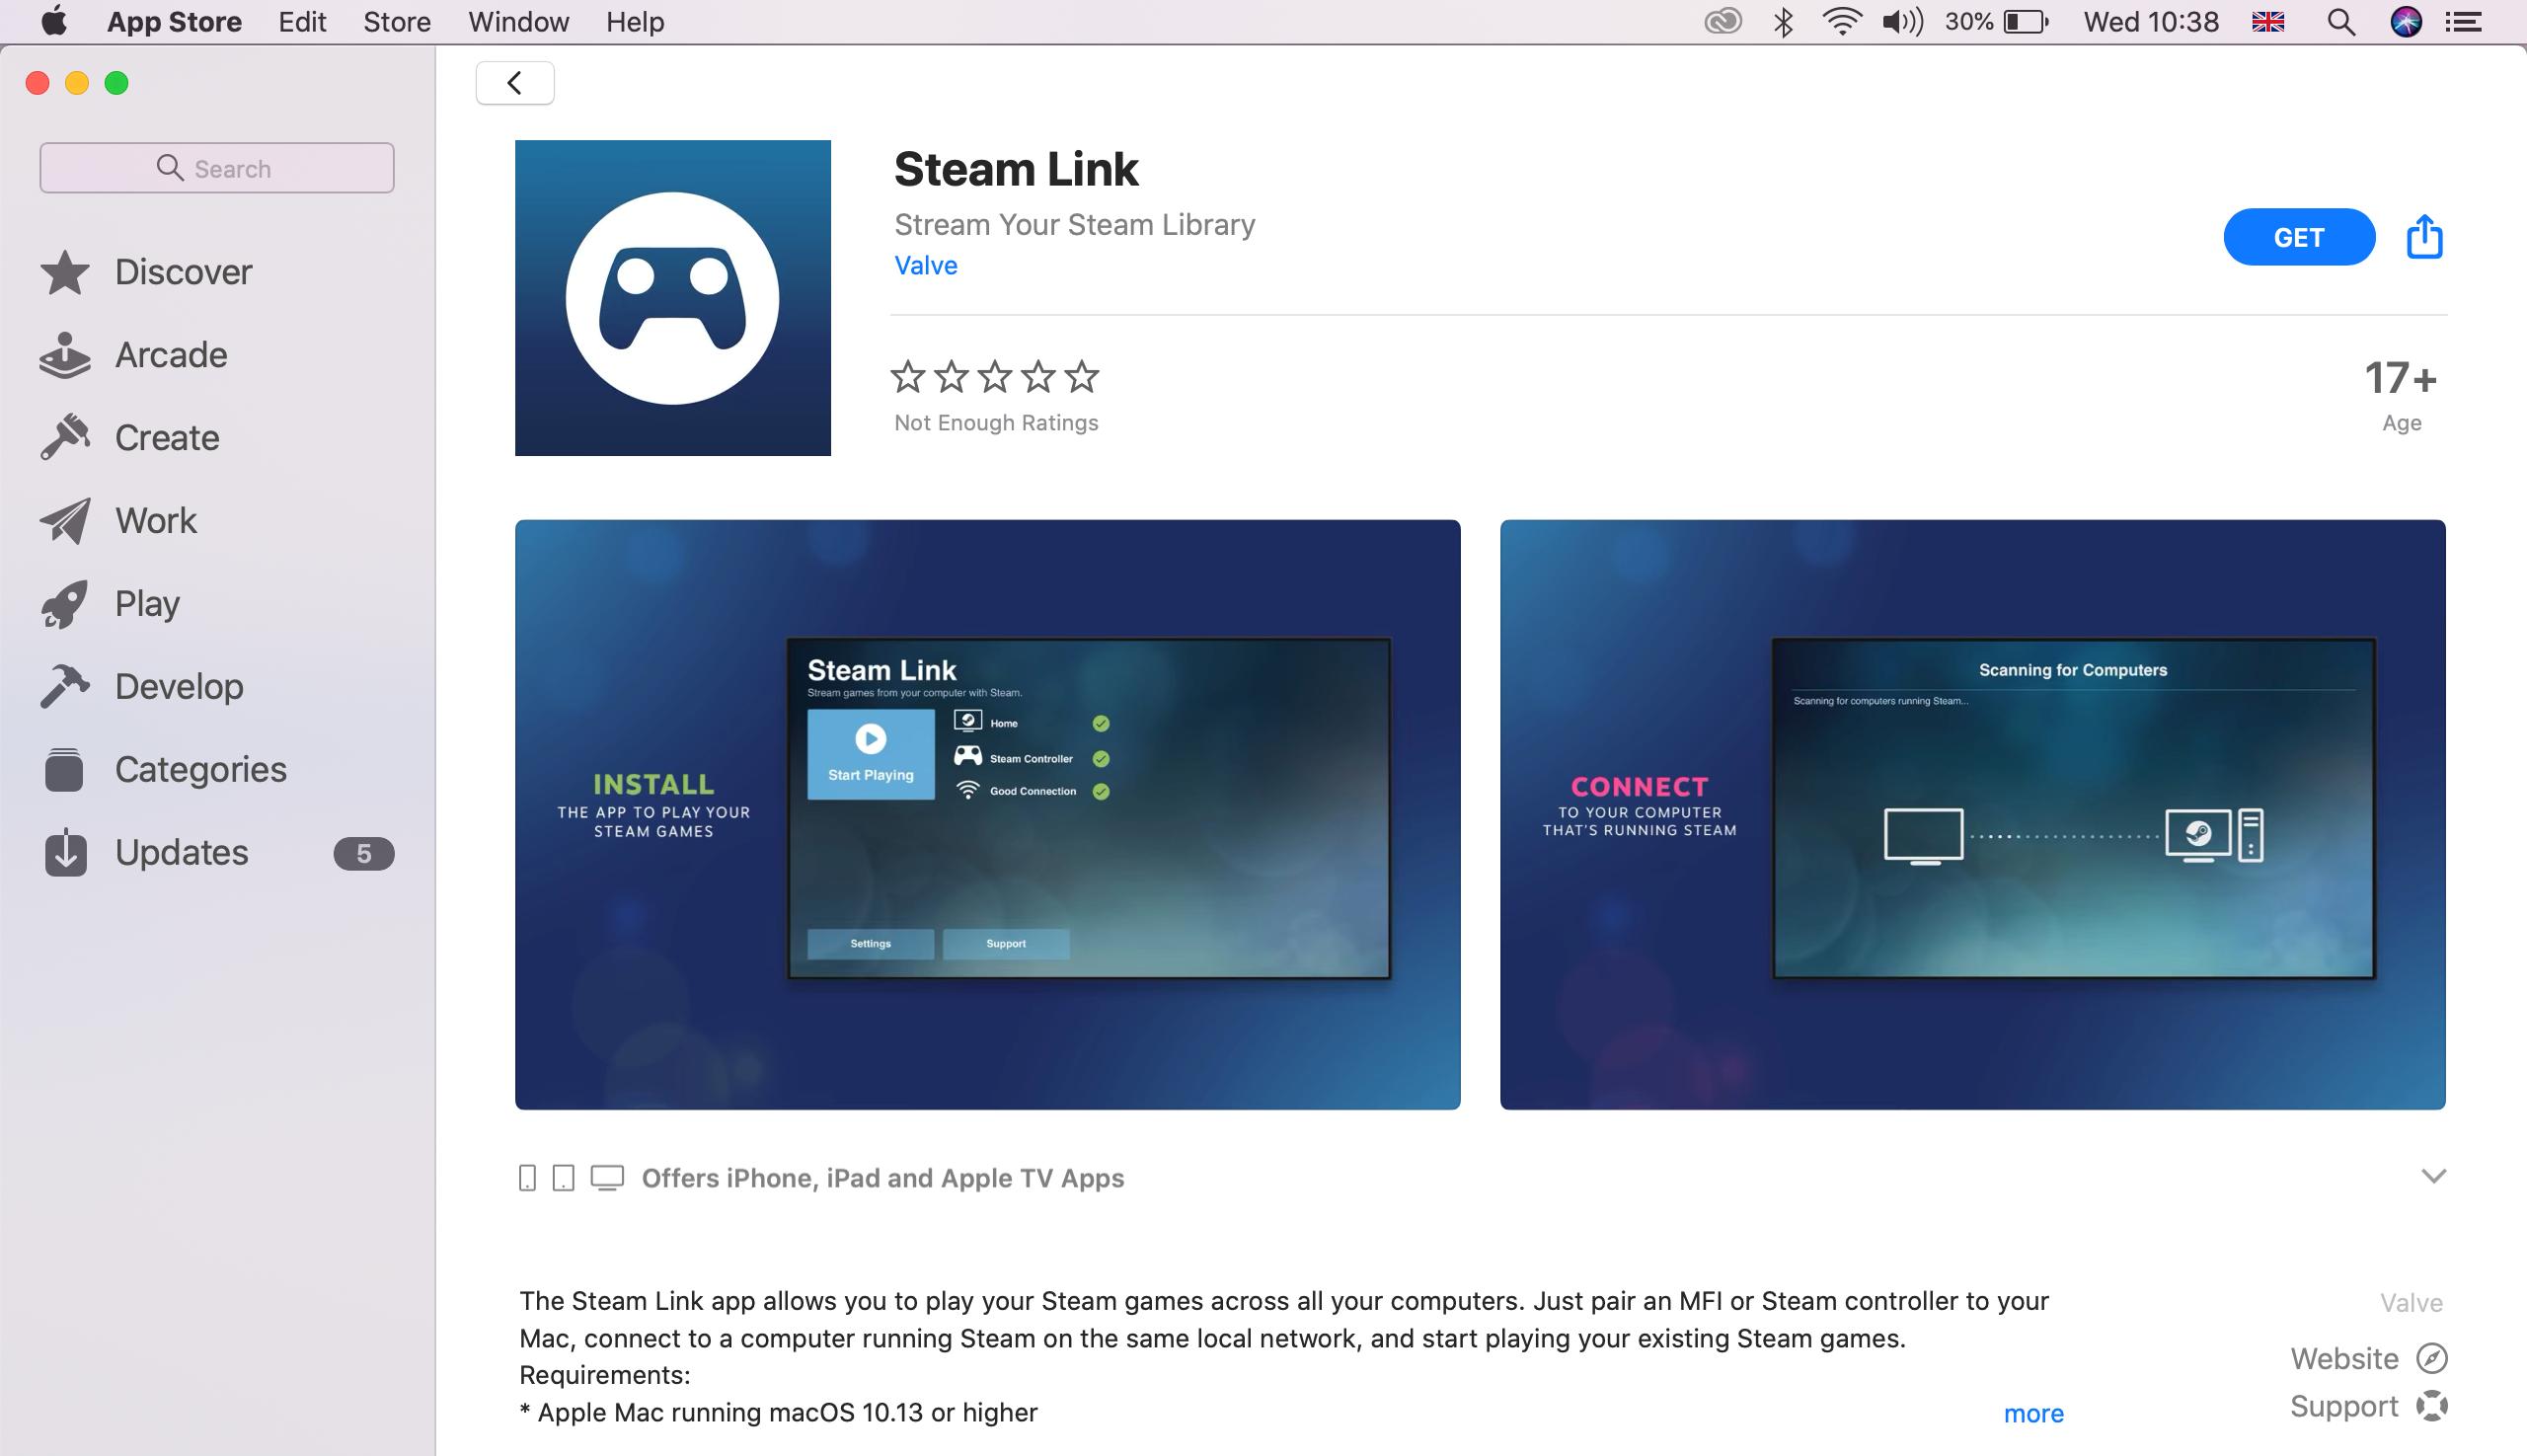 Steam Link on macOS